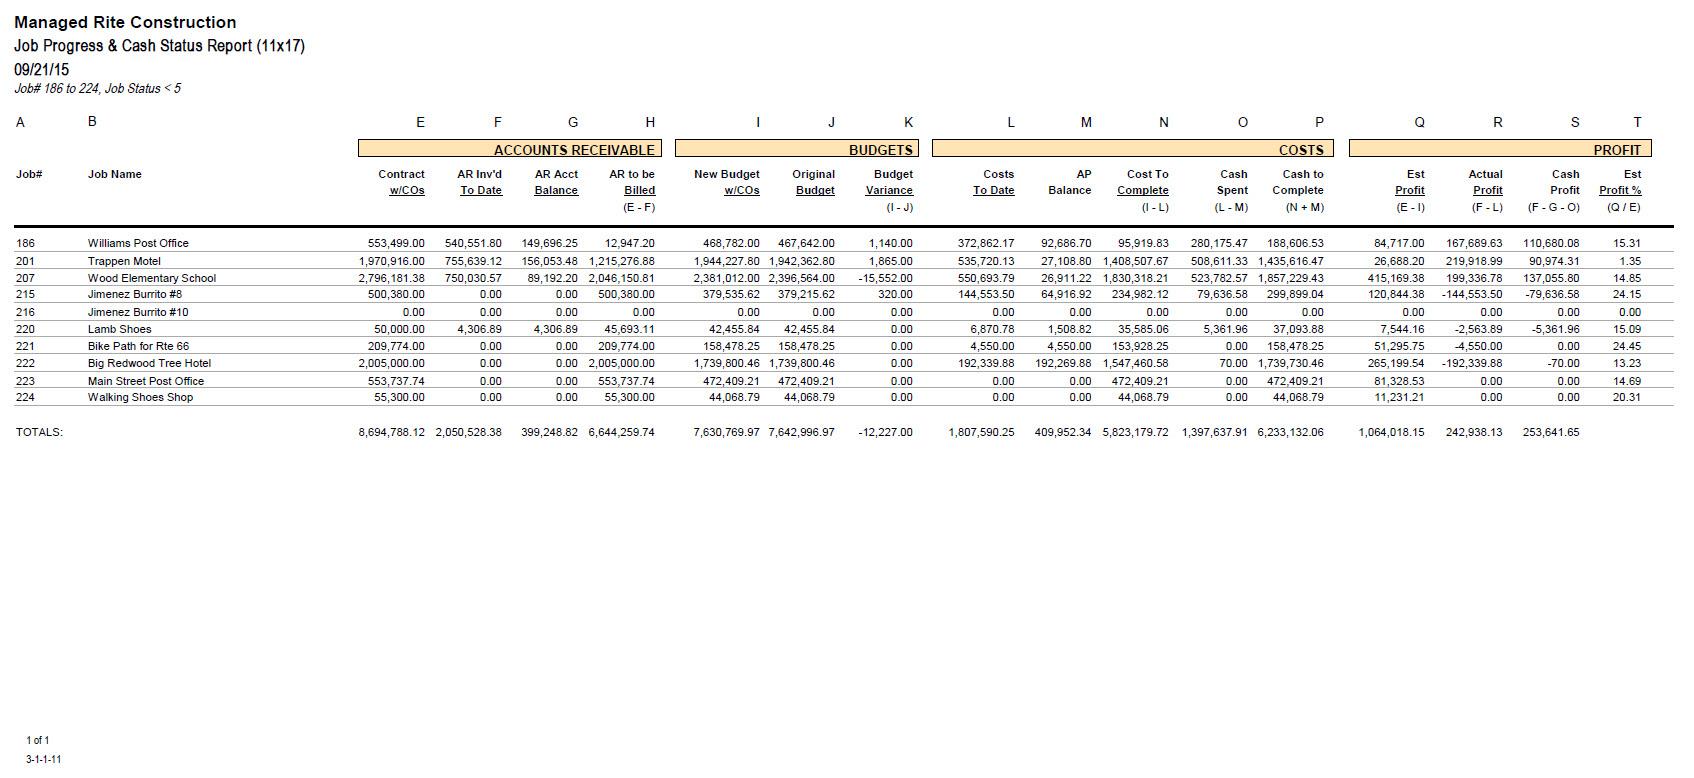 03-01-01-11 Job Progress & Cash Status Report (11x17)